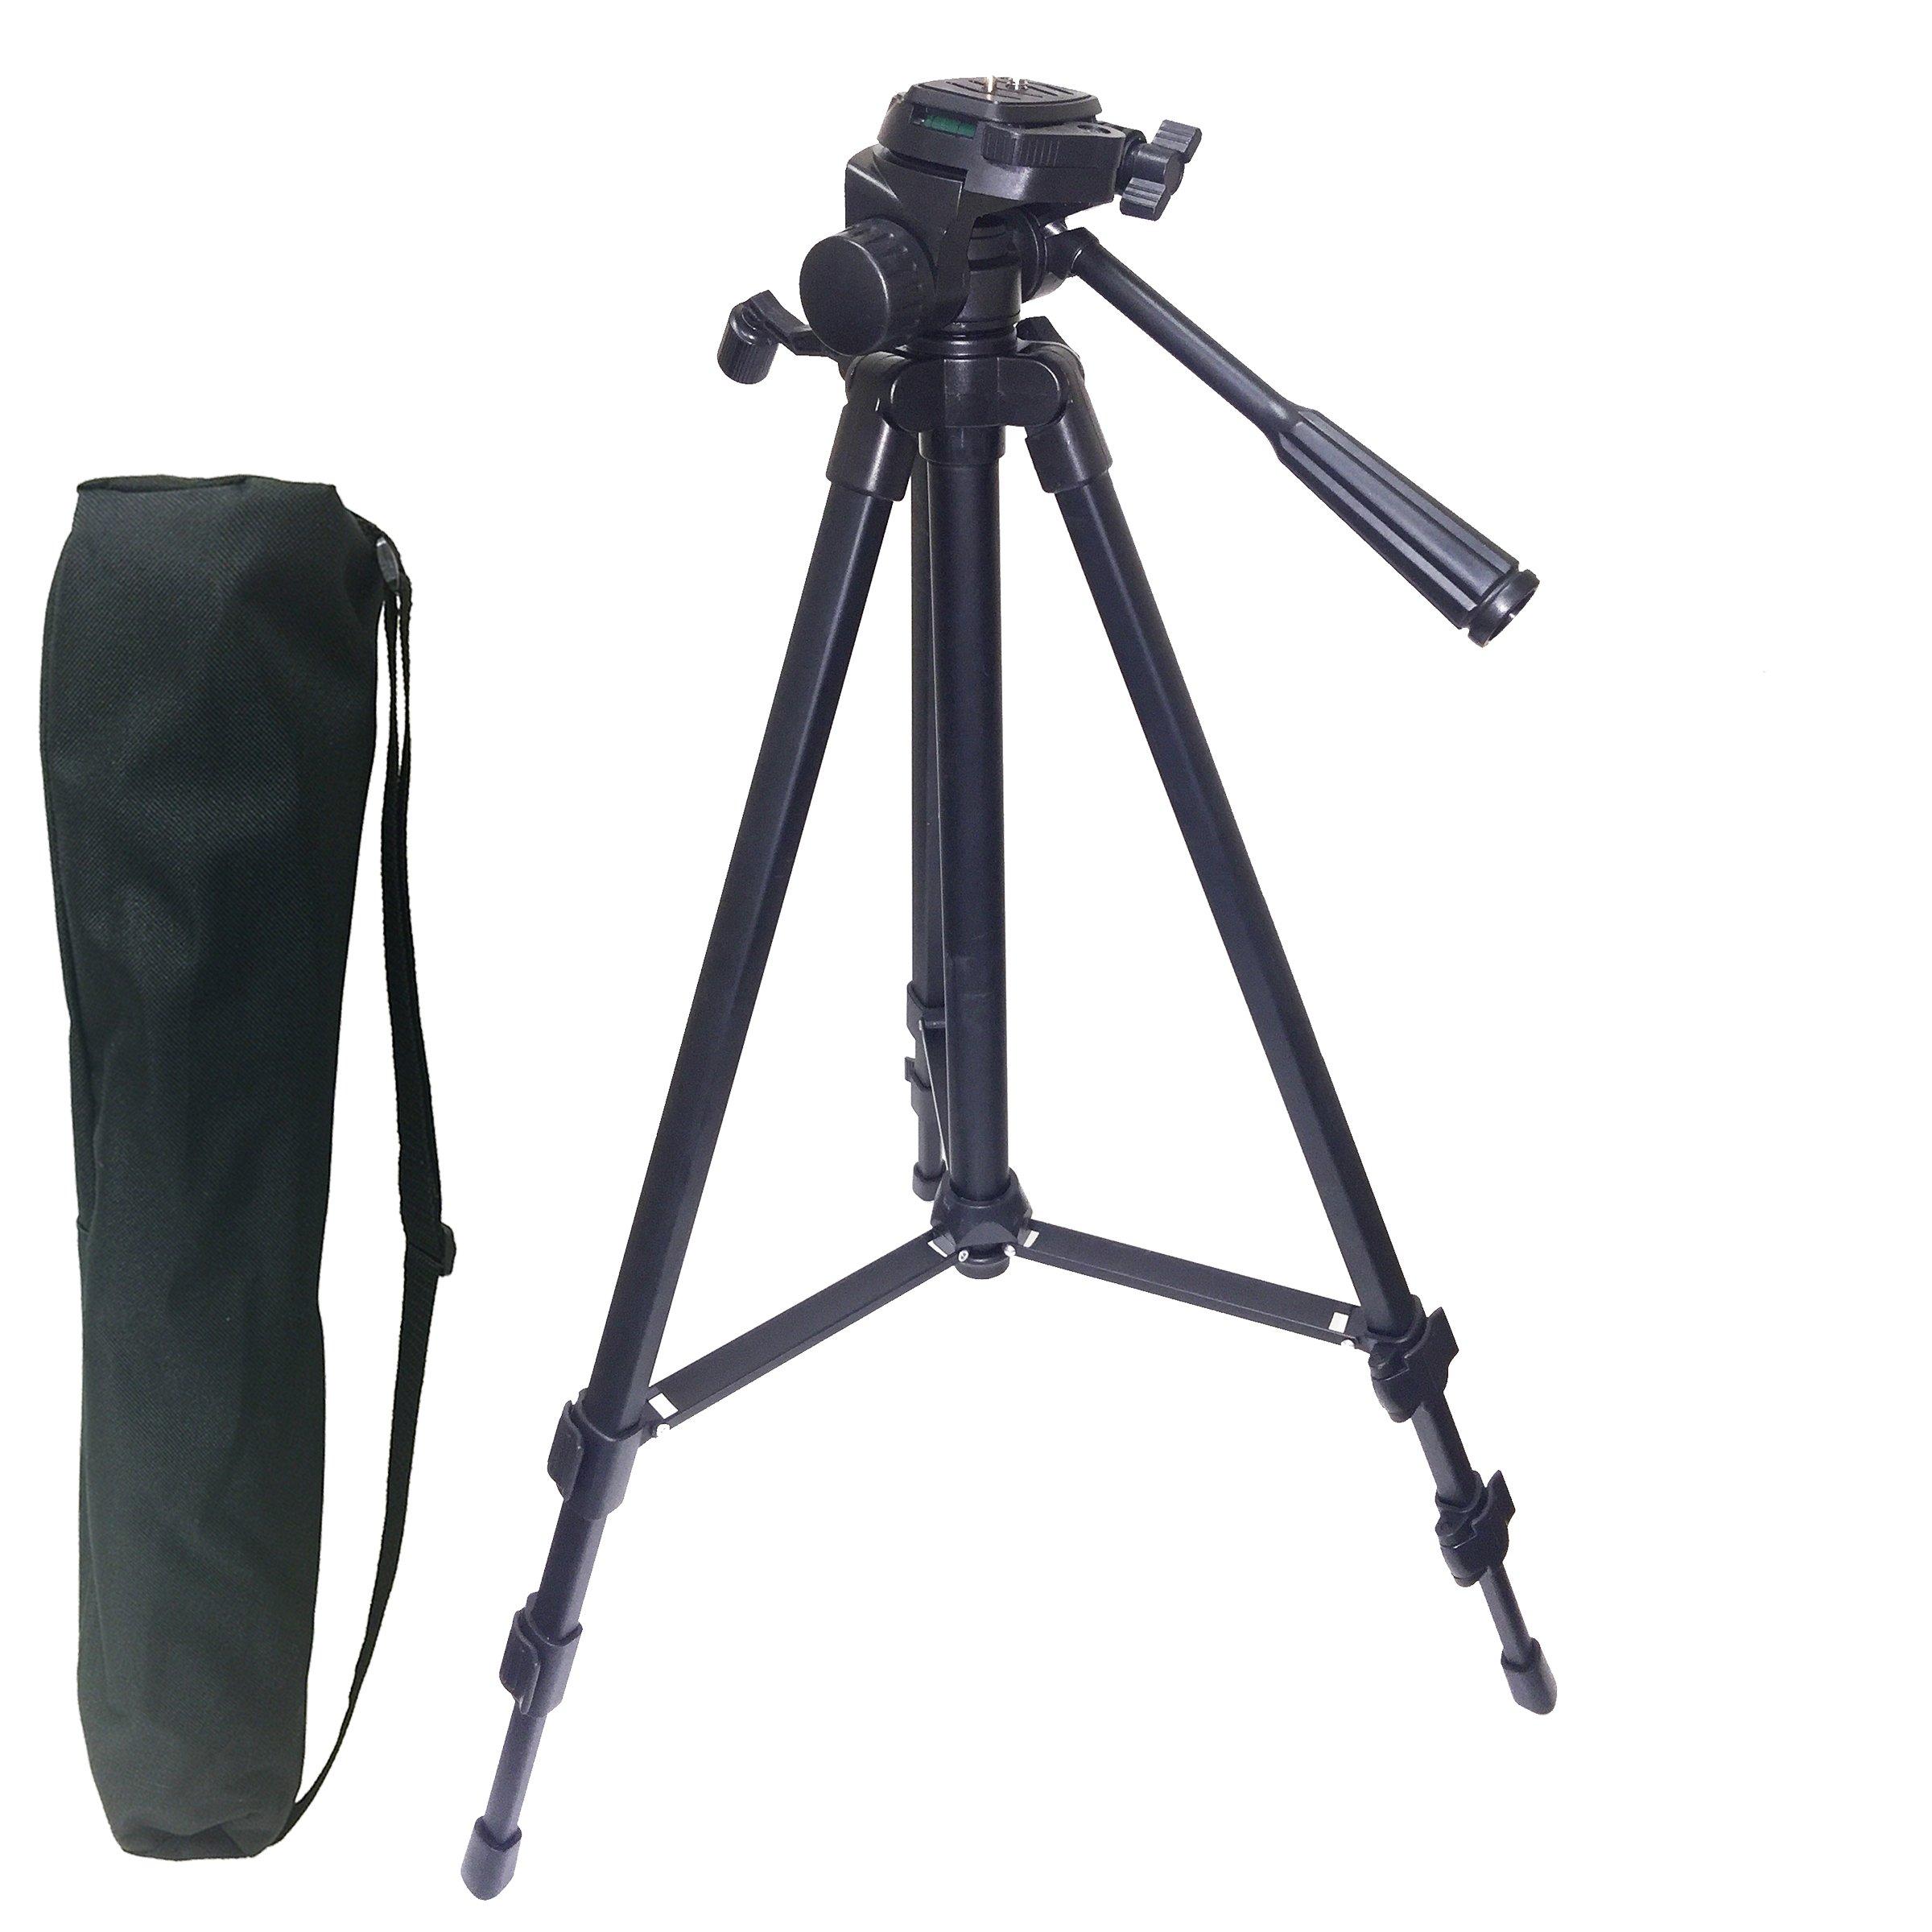 Sima STV-54K 54'' Pro Panorama Tripod, Black